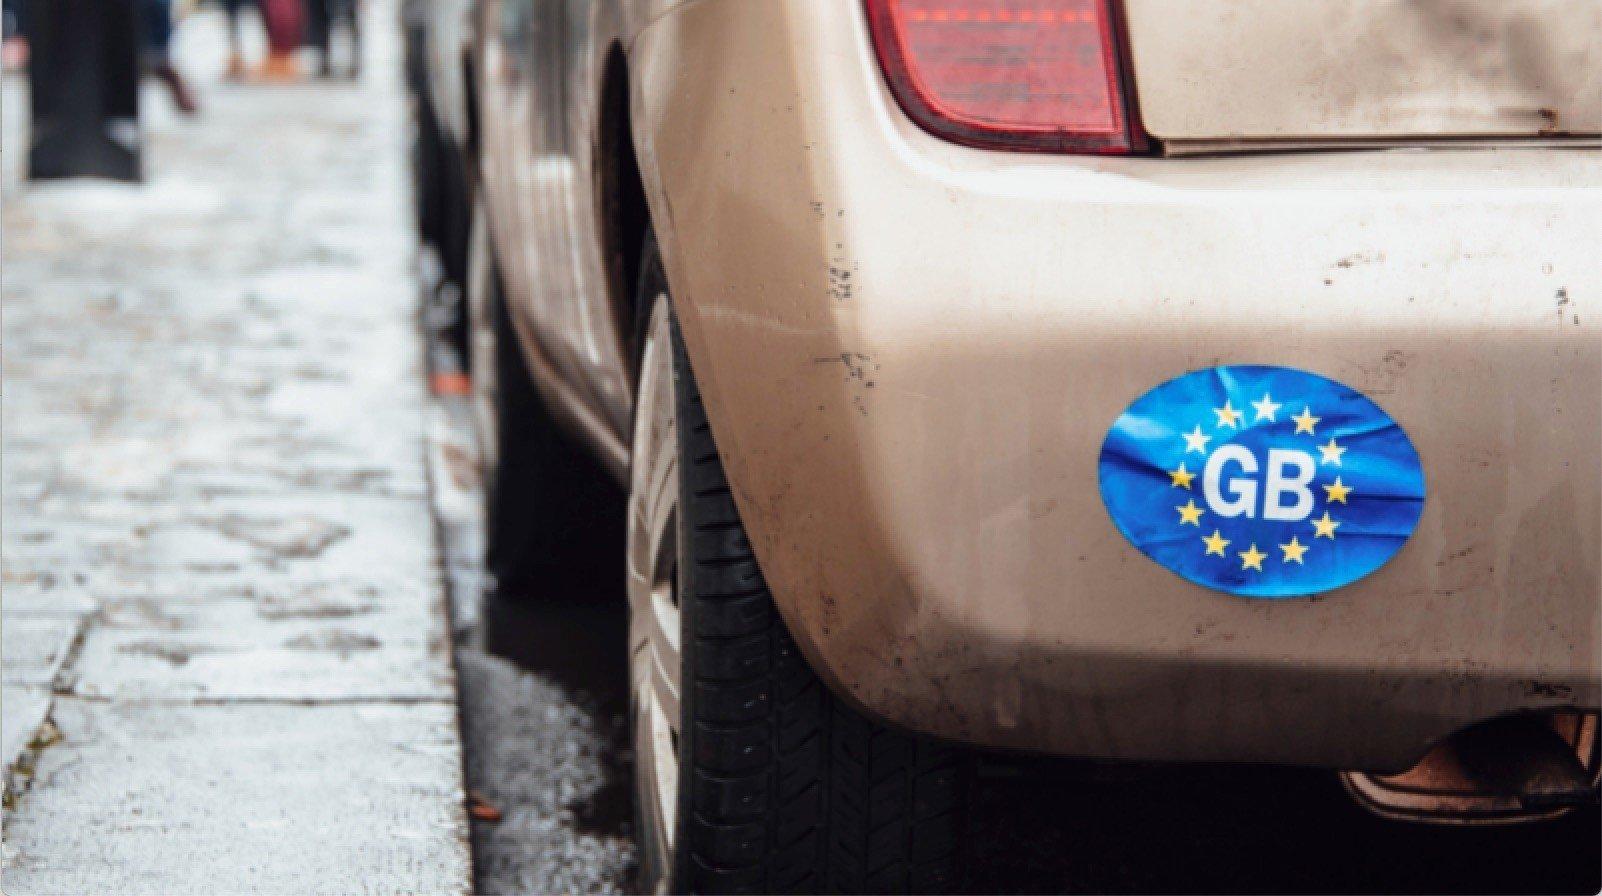 Great Britain Car Sticker